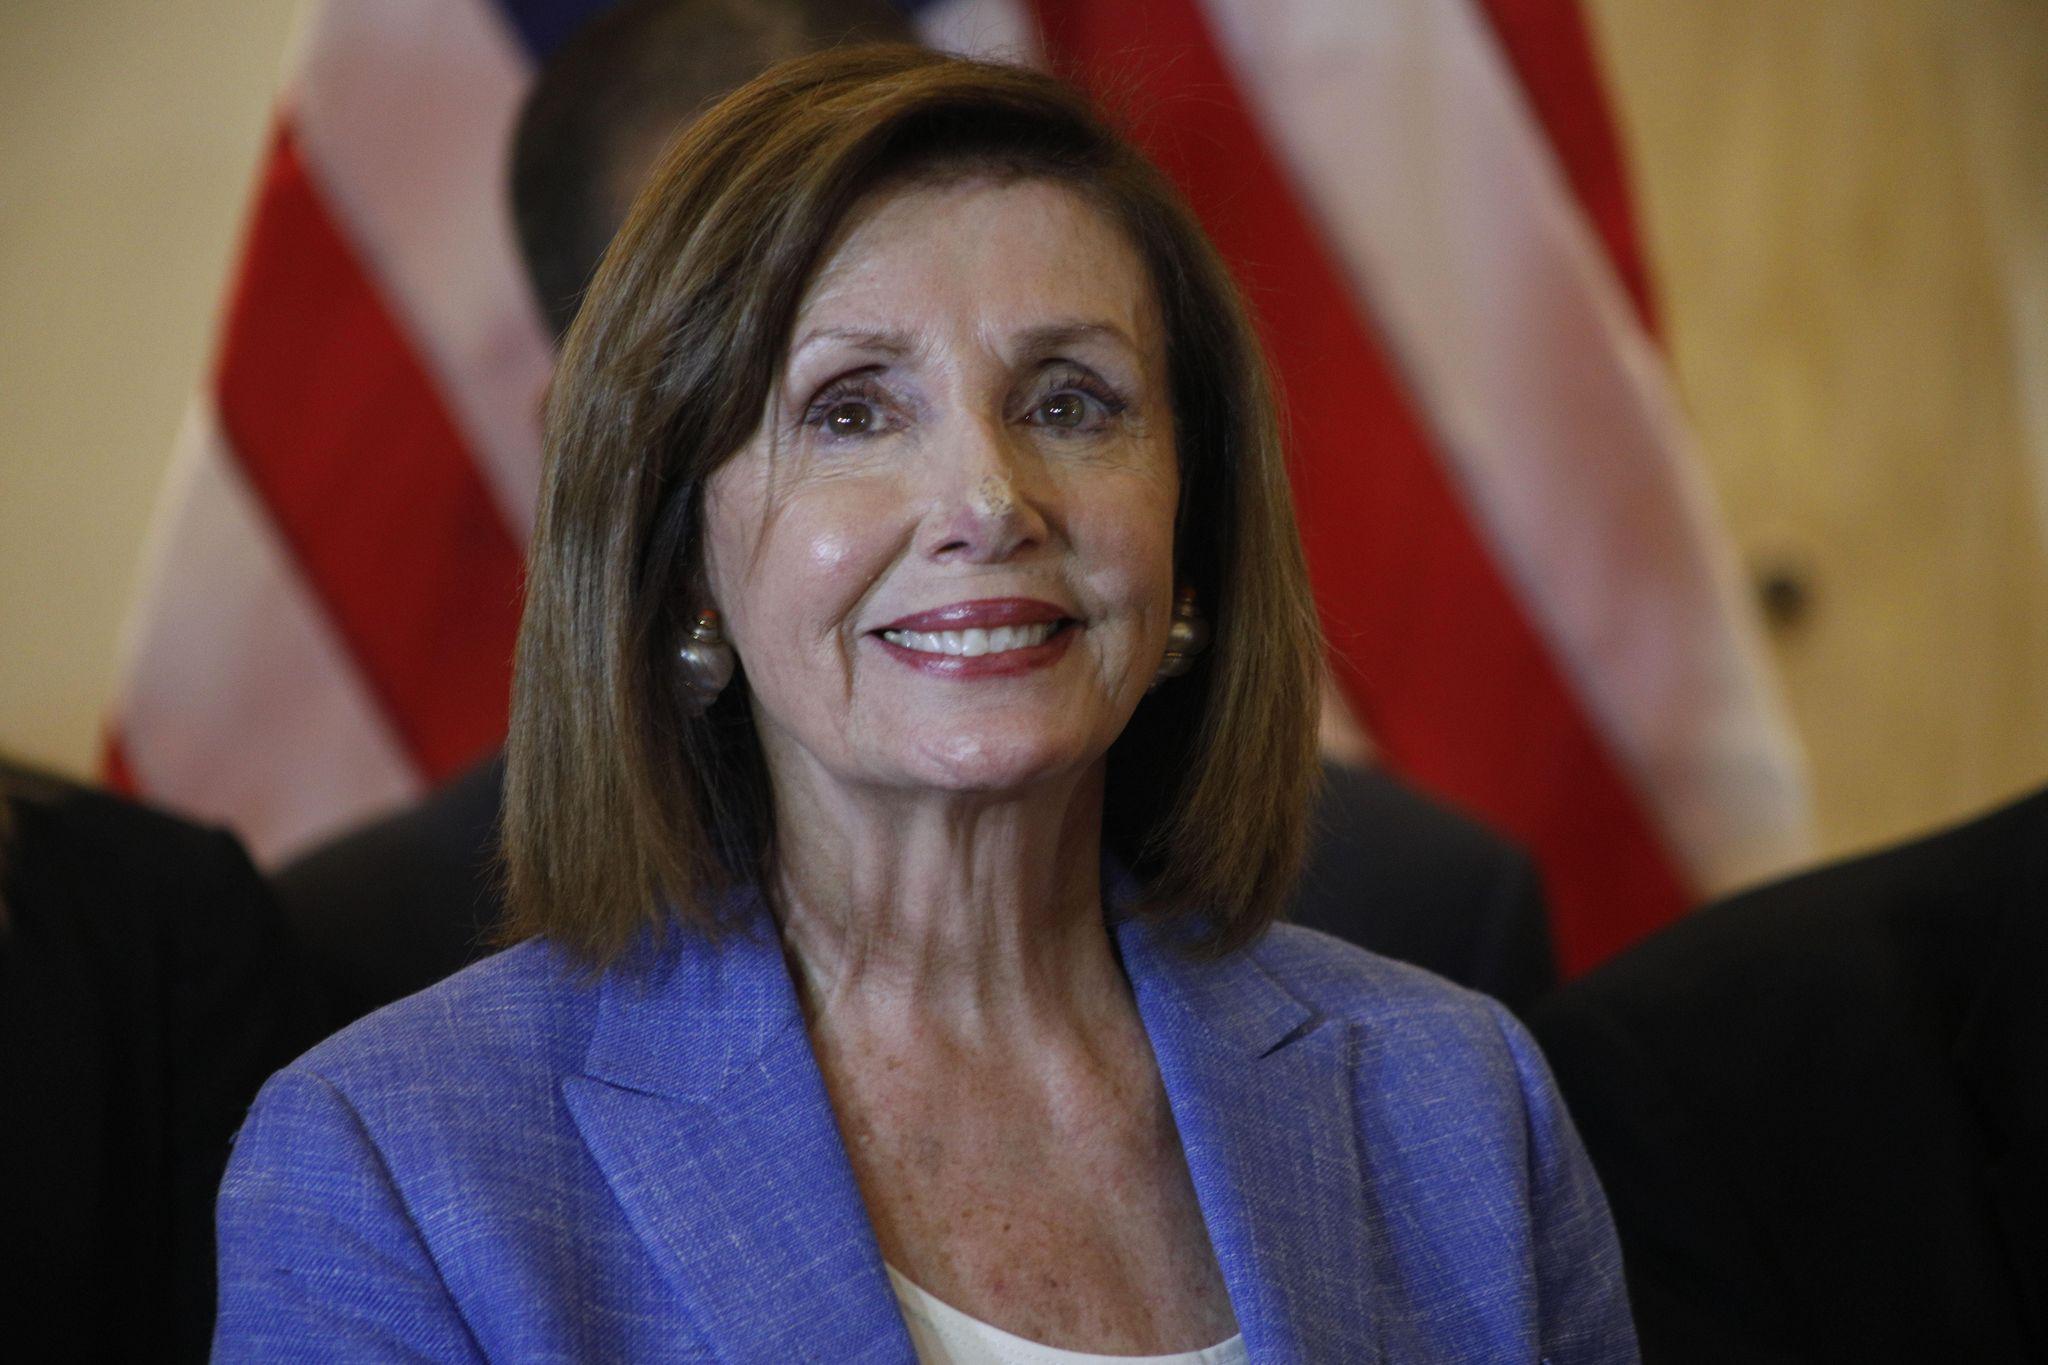 Pelosi emerges as alternative ambassador in bid to 'present the best face of America'